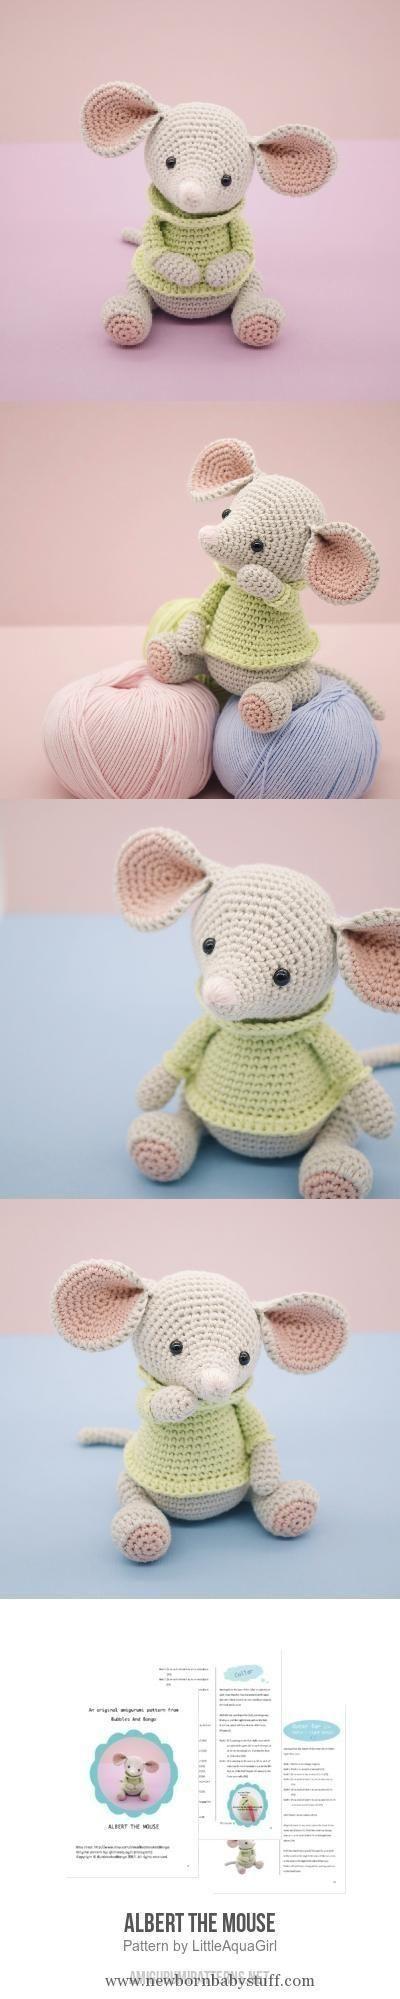 Baby Knitting Patterns Albert The Mouse Amigurumi Pattern...